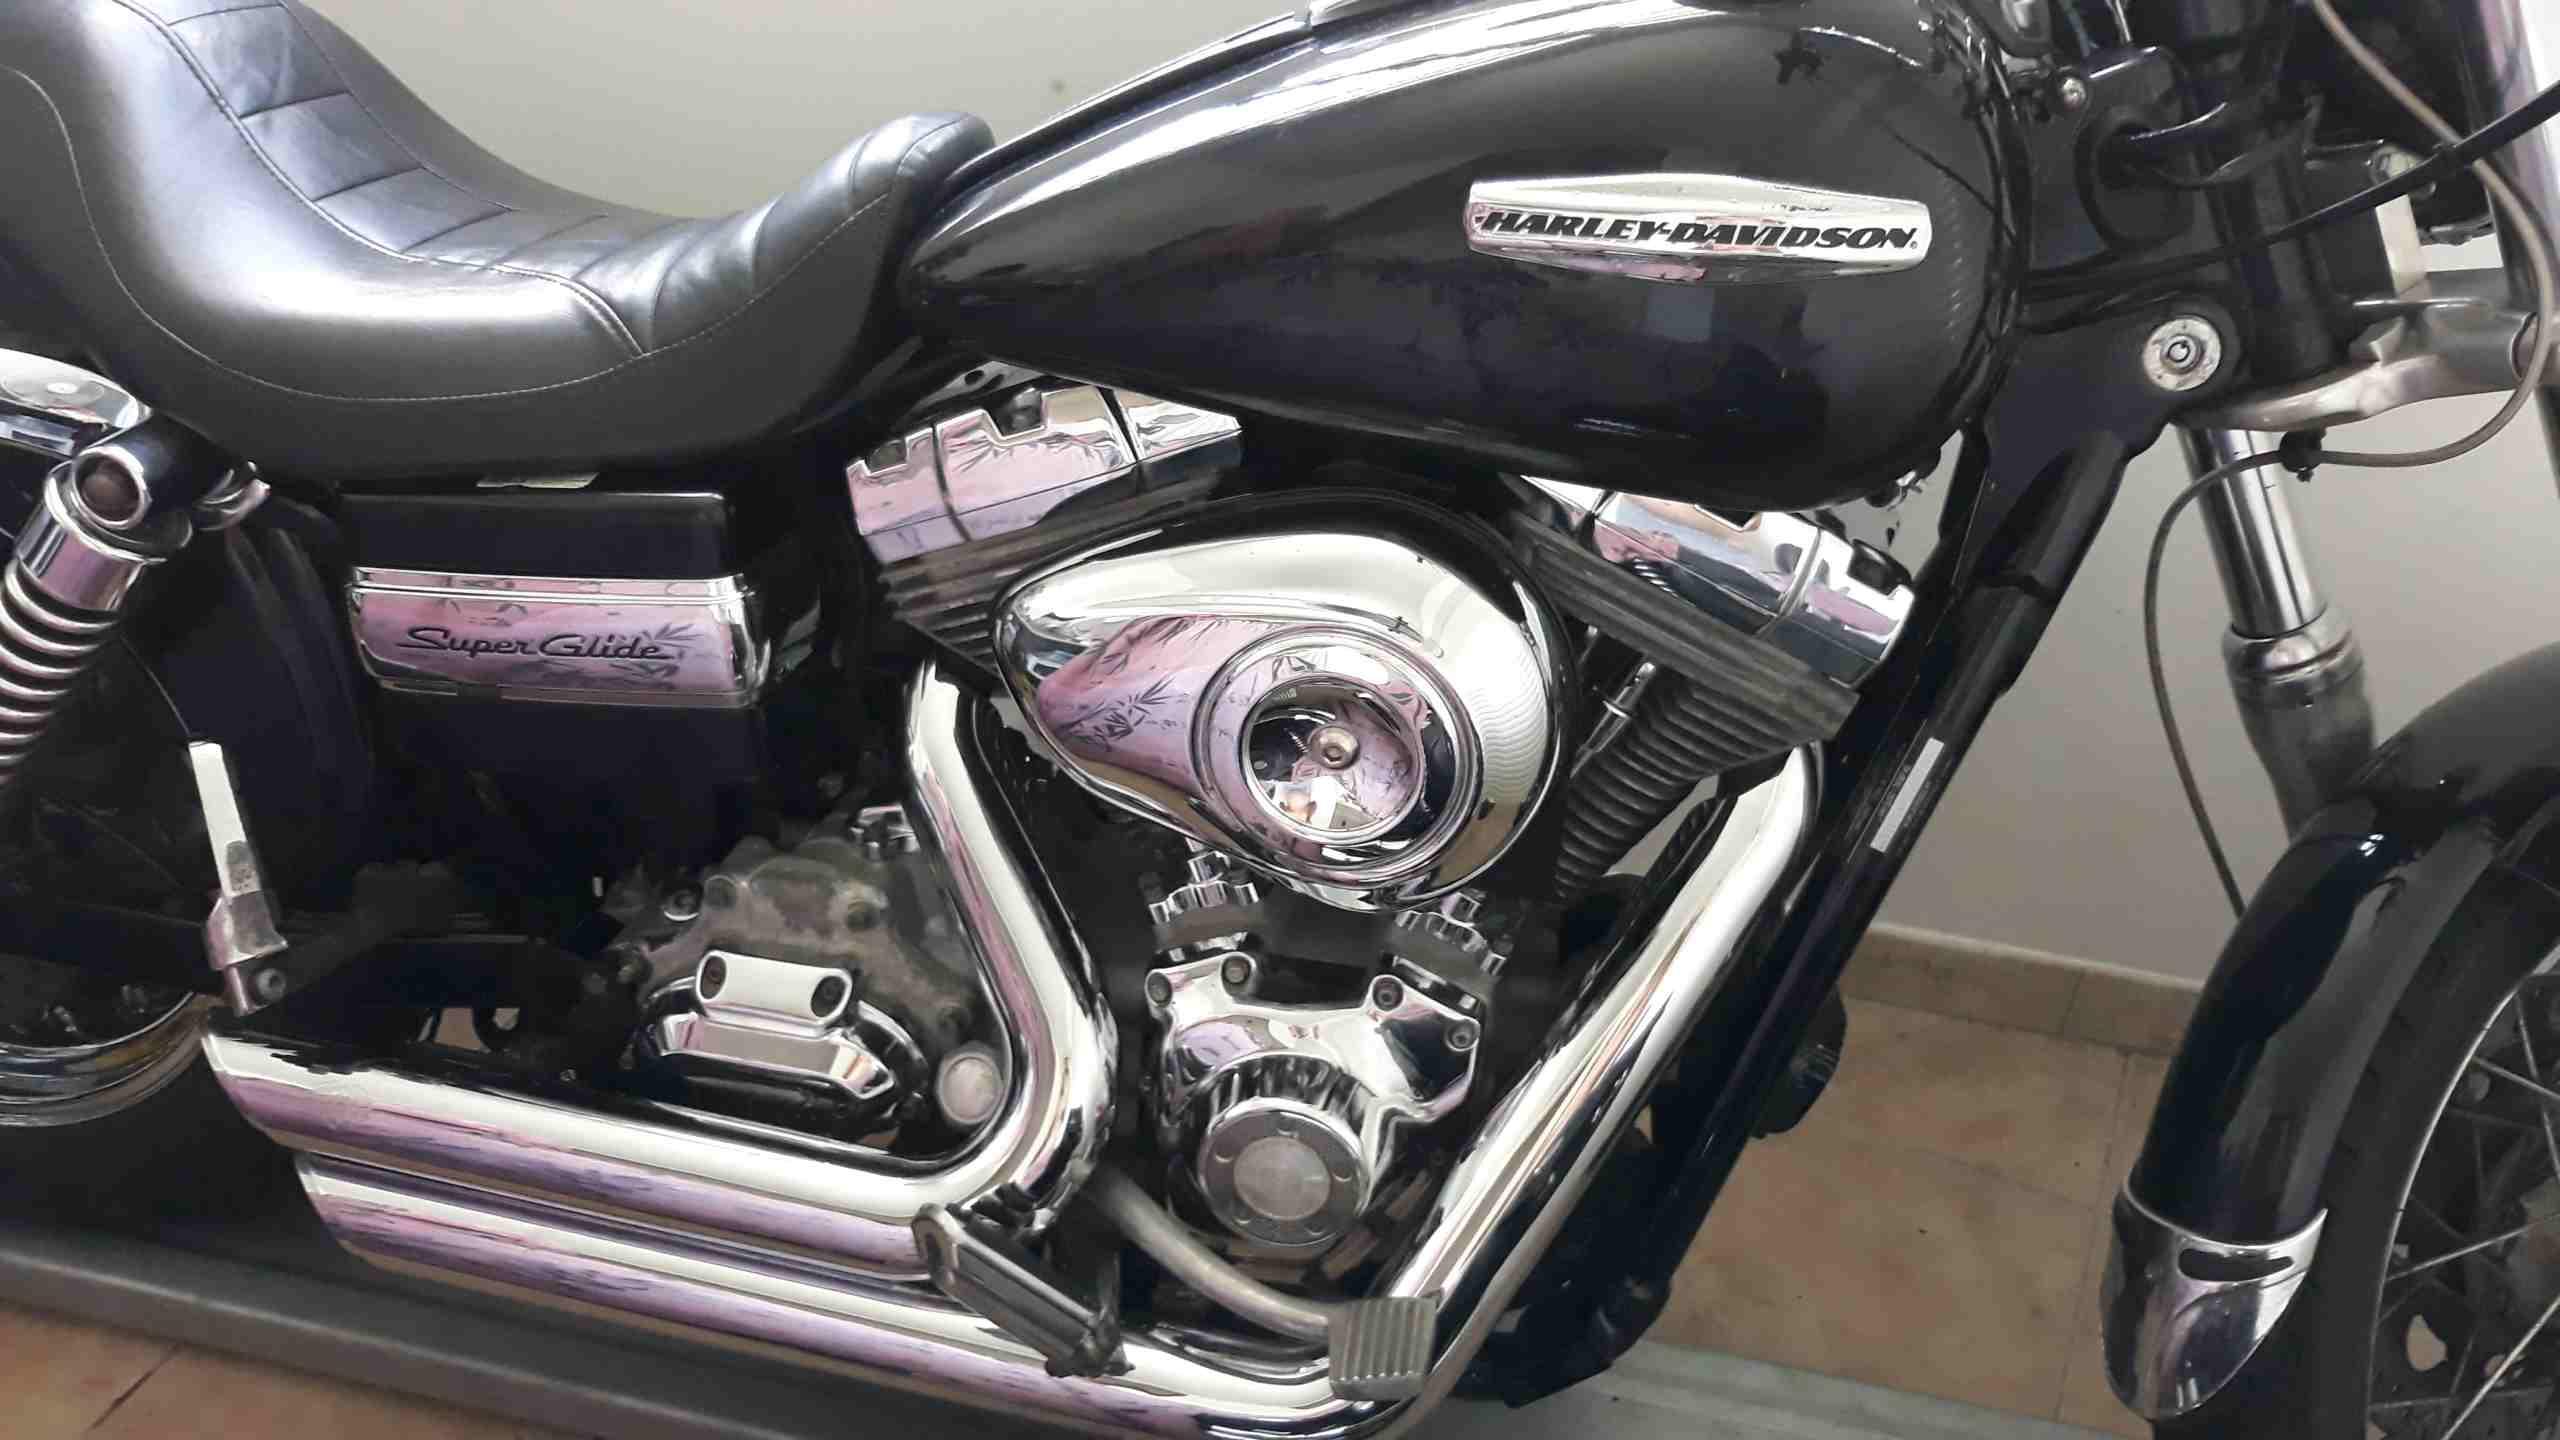 HARLEY DAVIDSON SUPER GLIDE 2008 . 1584cc